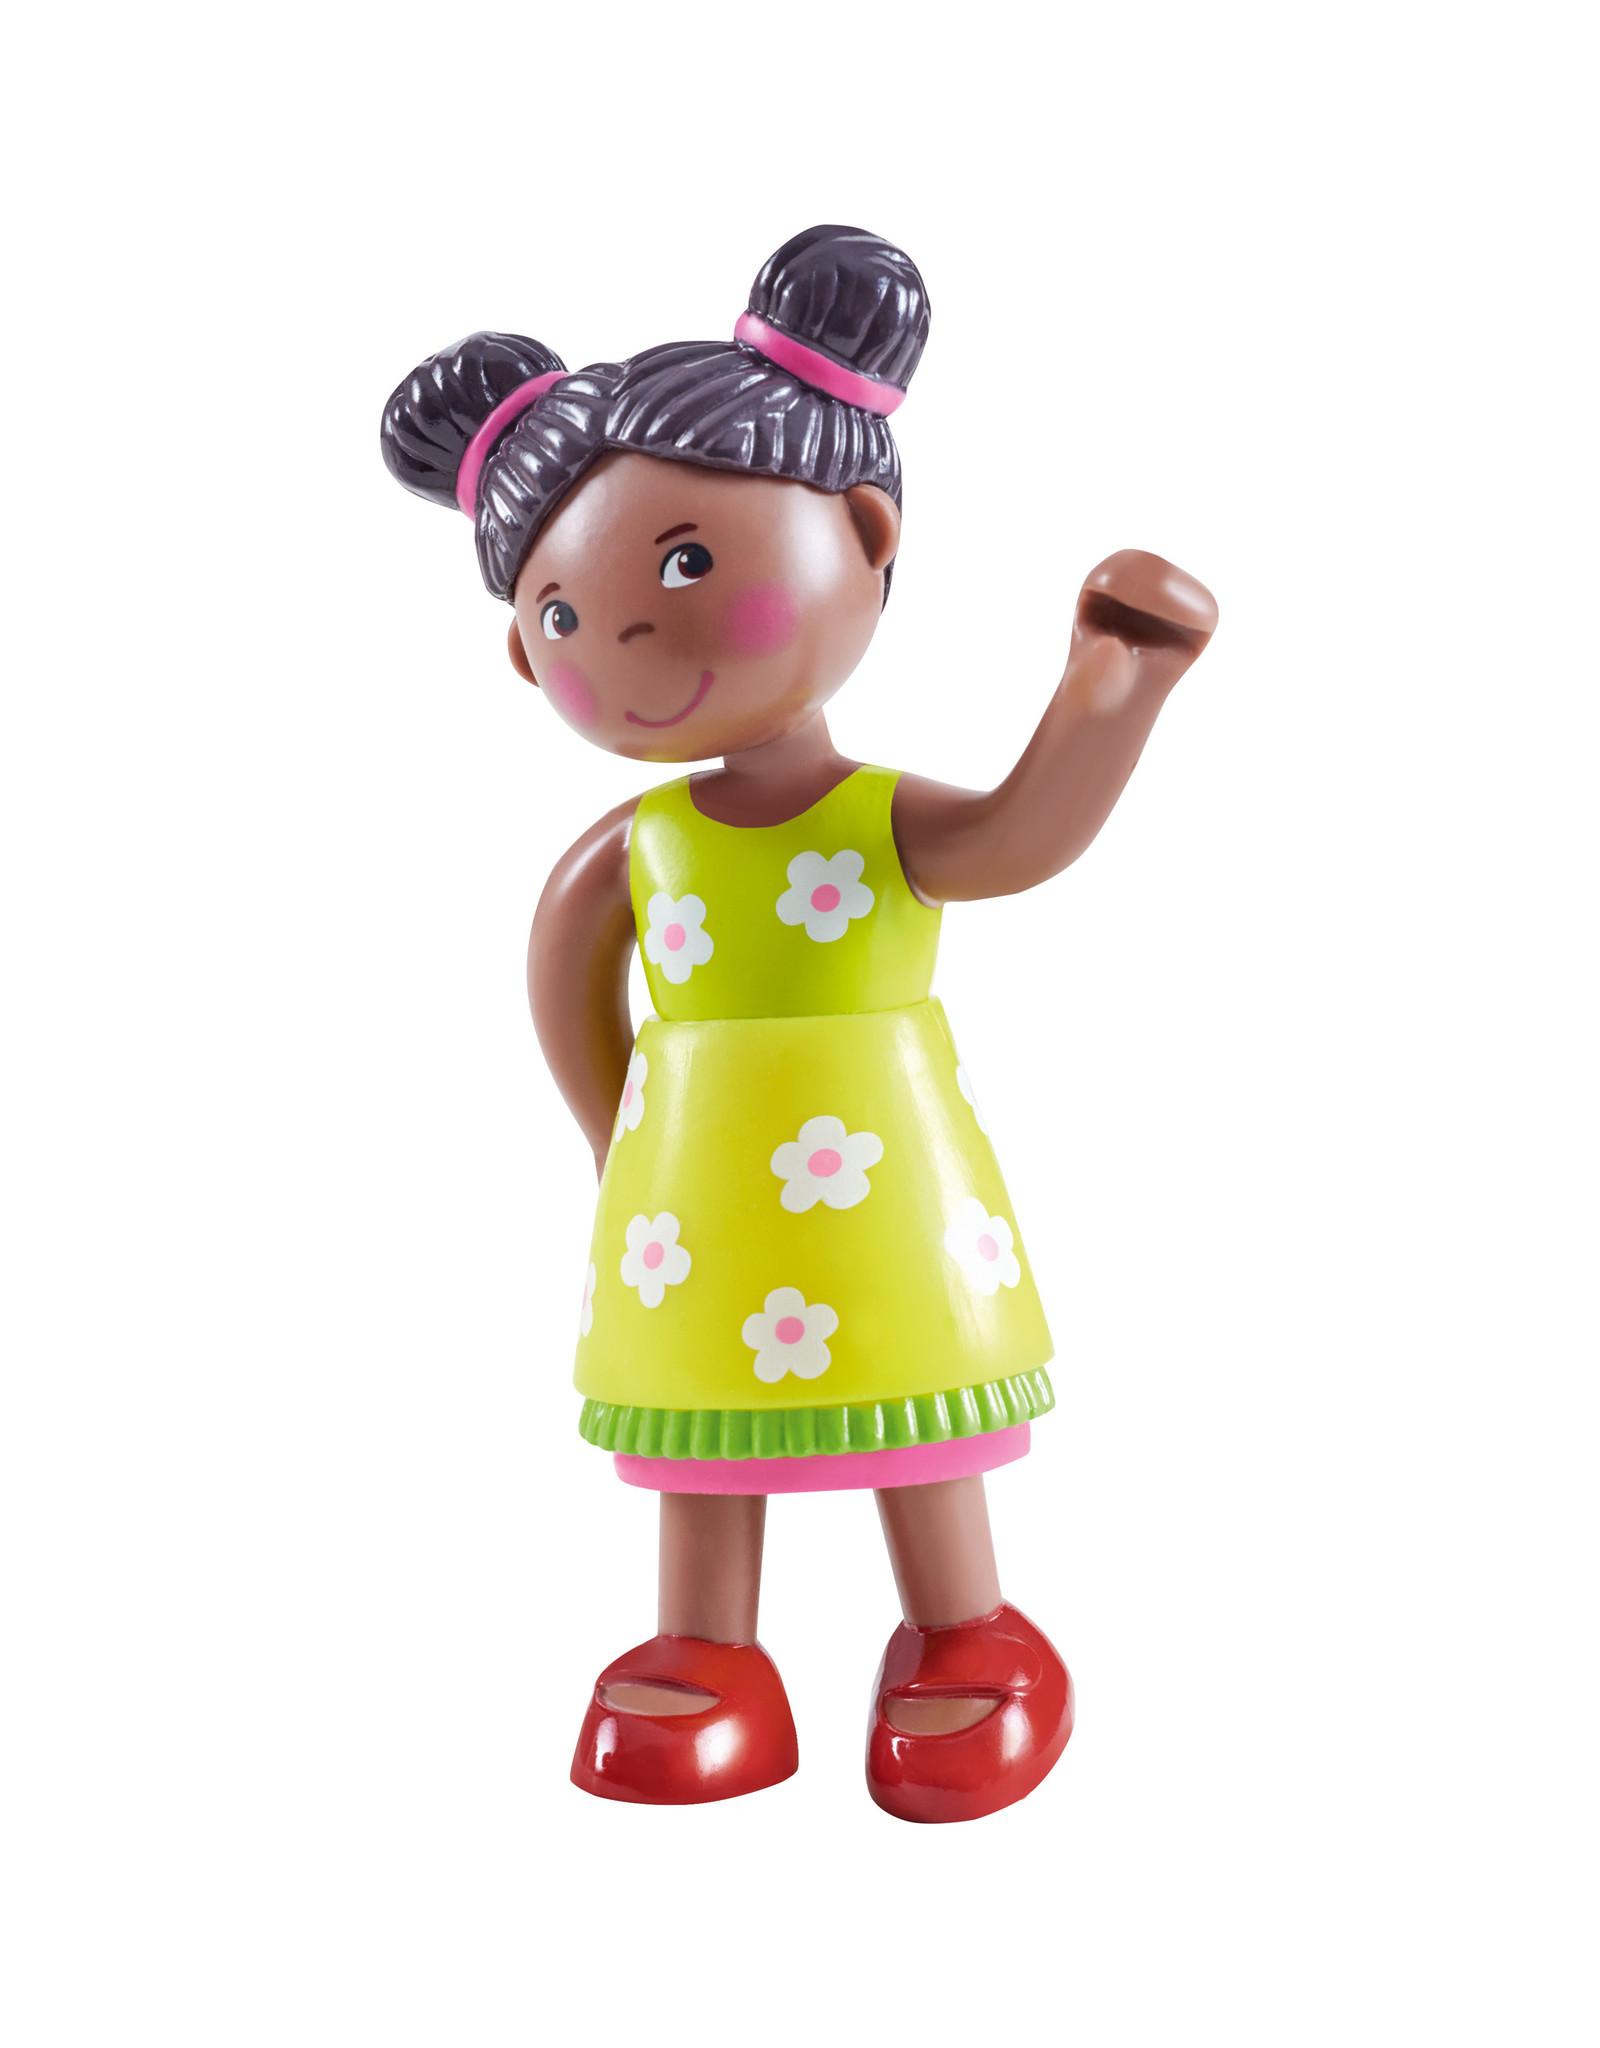 HABA Little Friends Naomi Doll